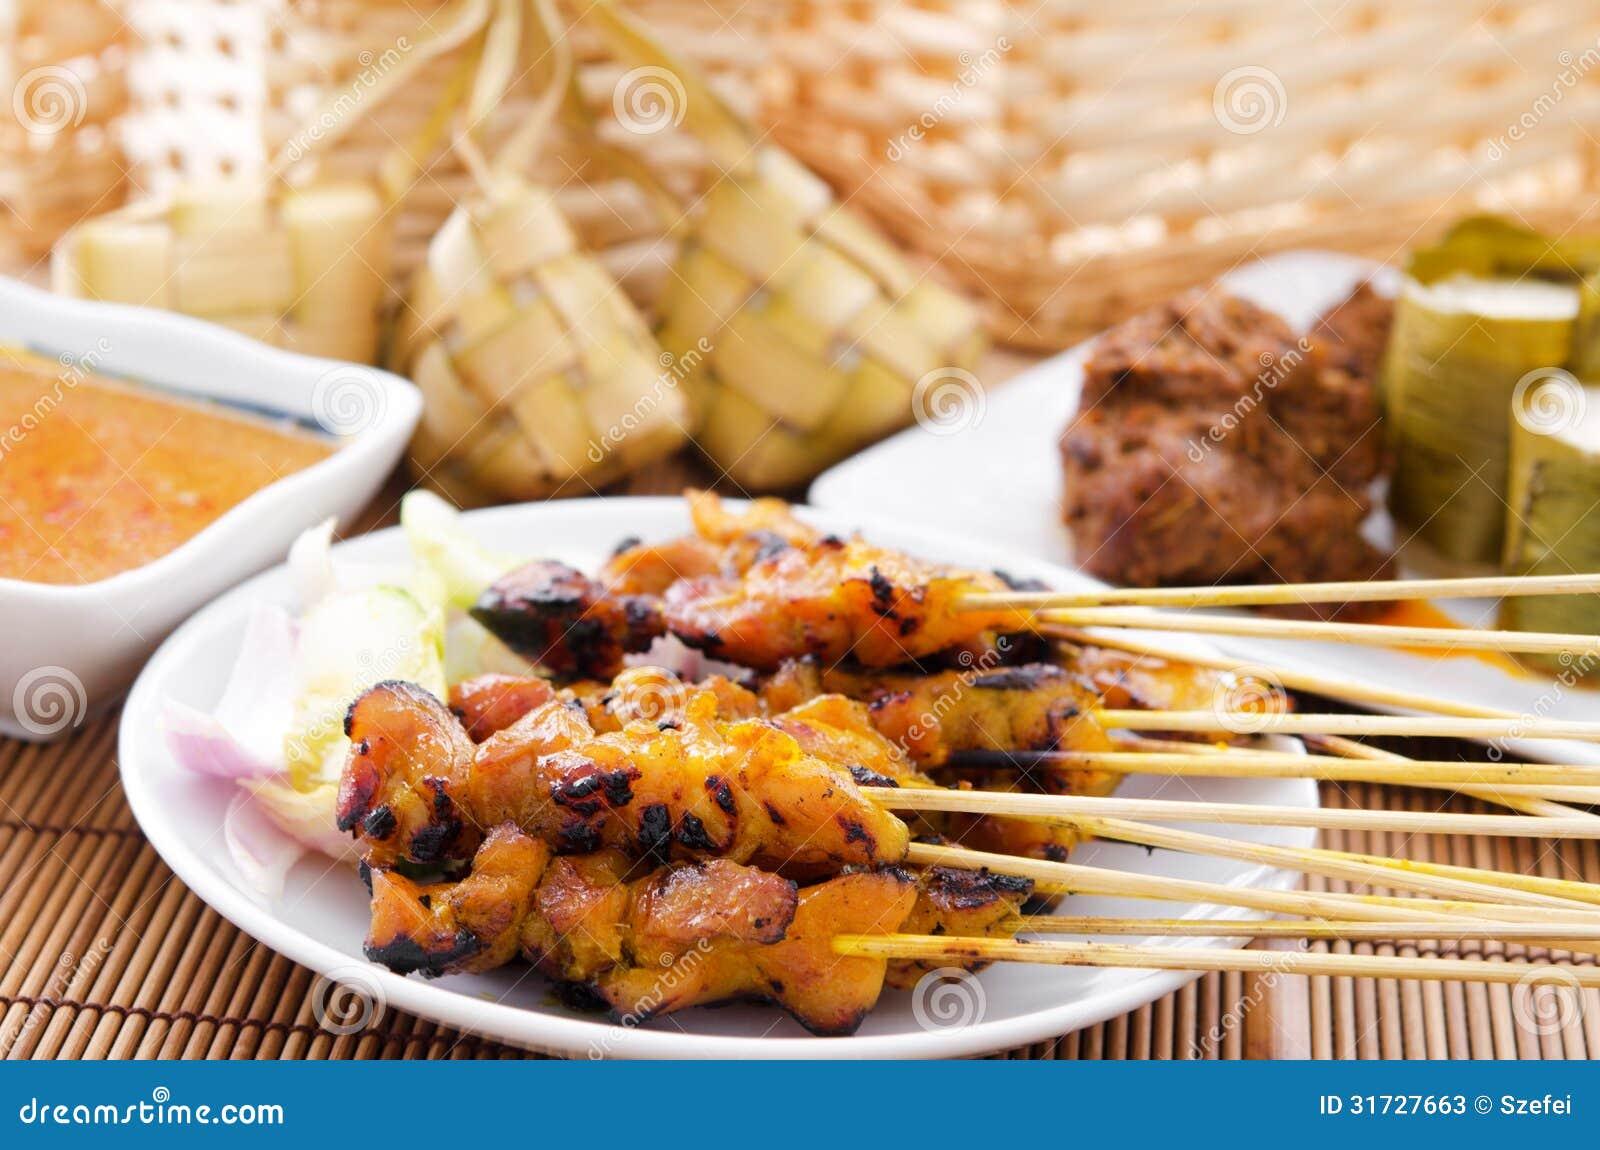 ketupat rice dumpling is - photo #37